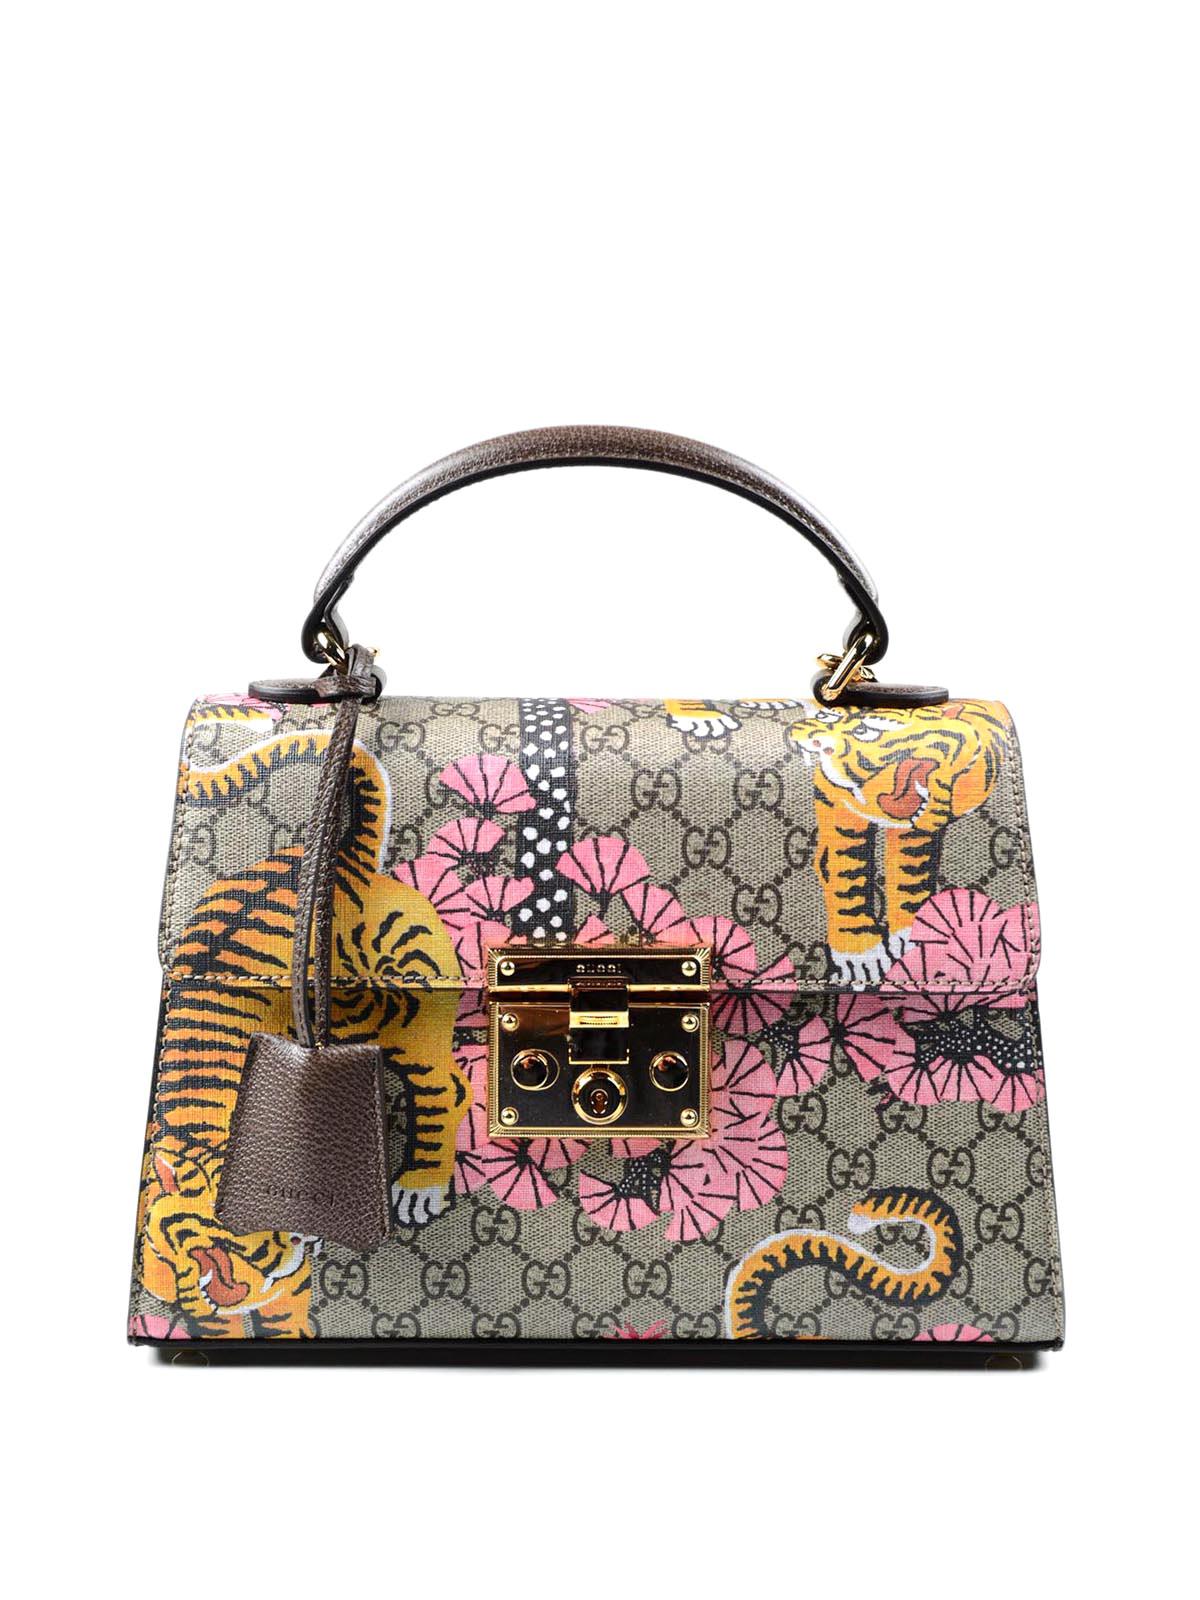 93e91dc3dc83 Gucci - Padlock Bengal handbag - totes bags - 453188 K5P3G 9967